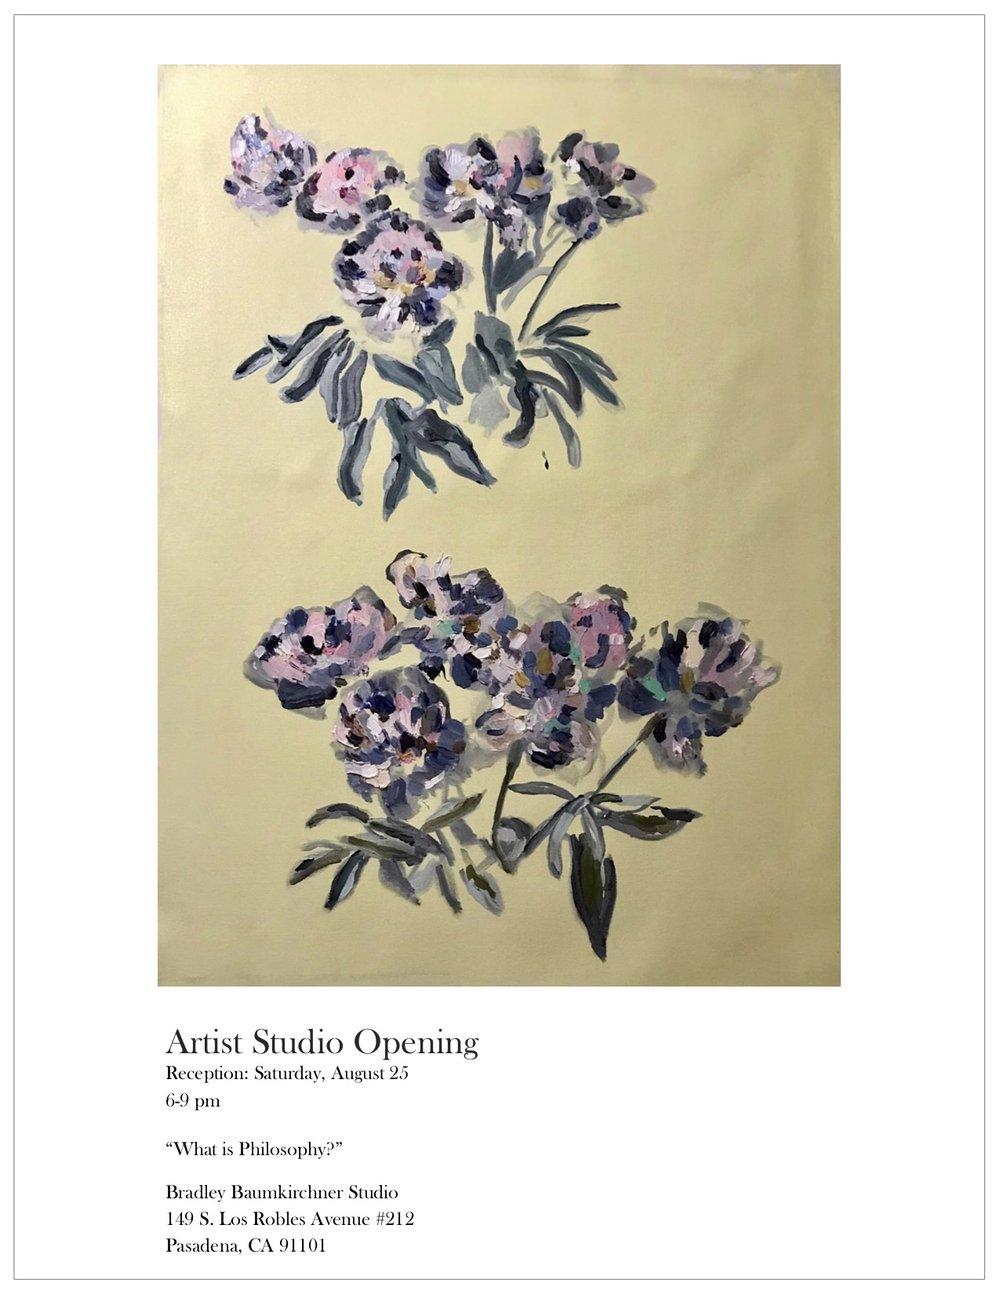 Bradley Baumkirchner Artist Studio Opening (SS).jpg